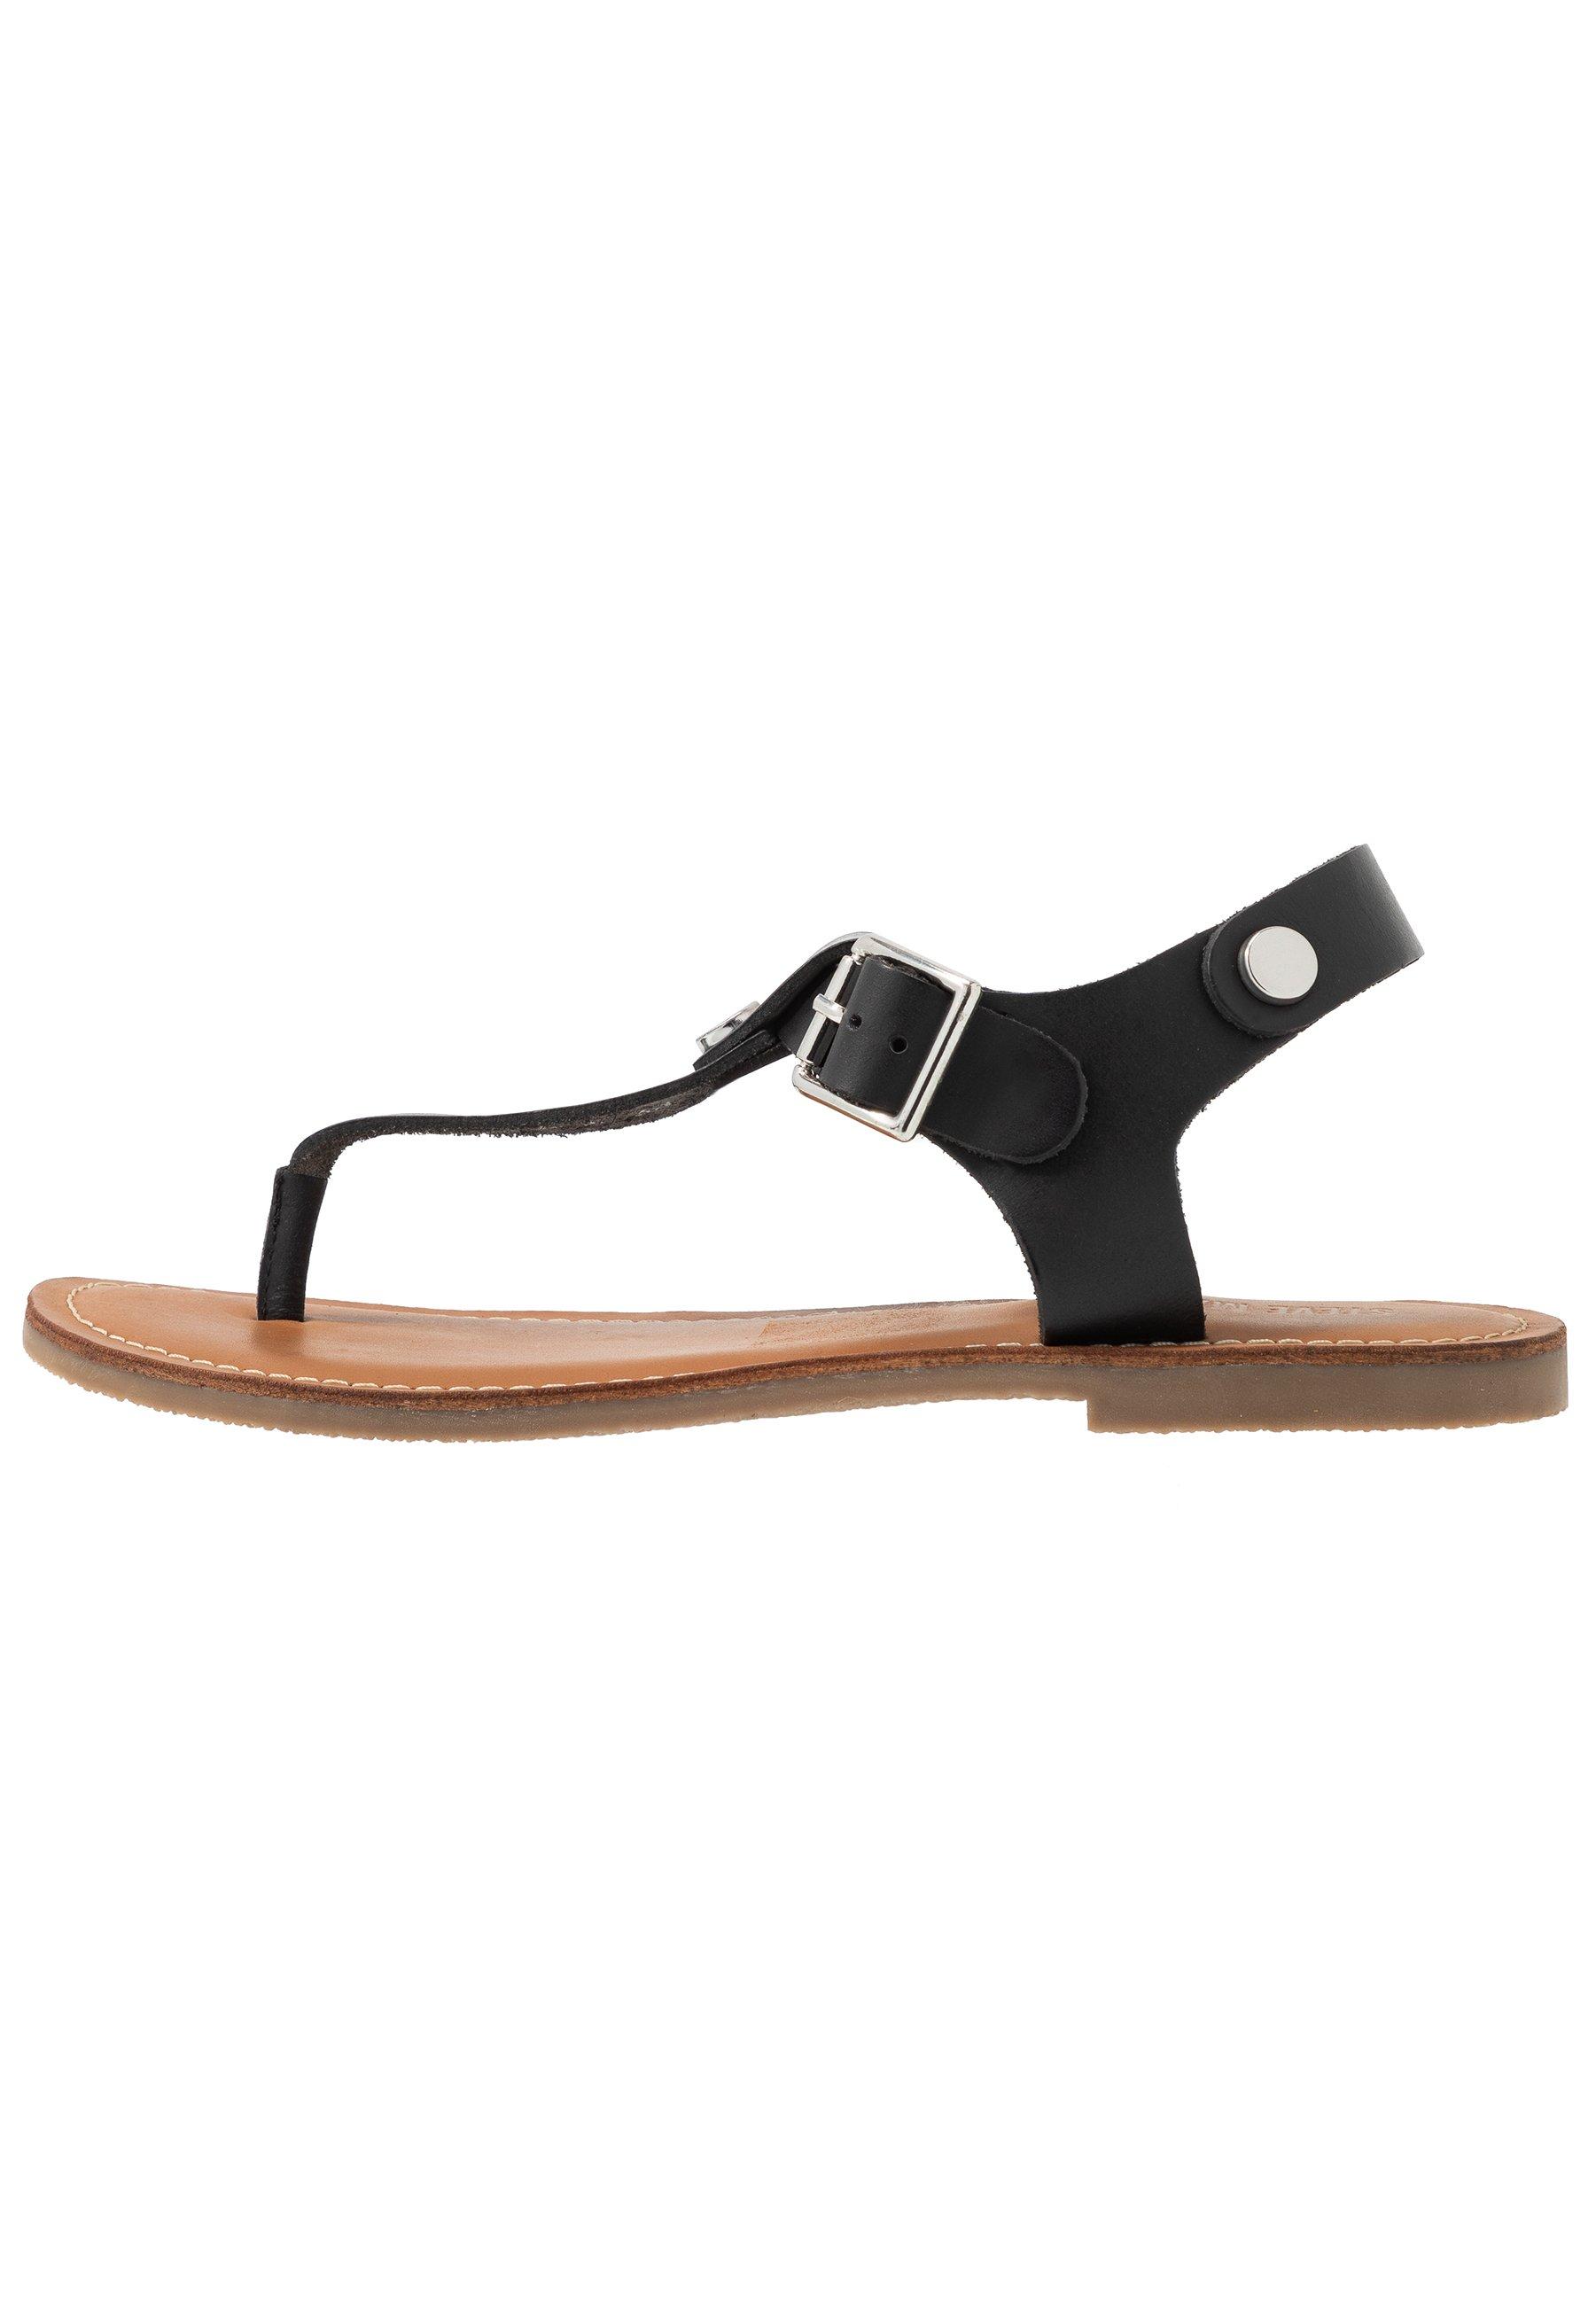 Steve Madden Tally - T-bar Sandals Black